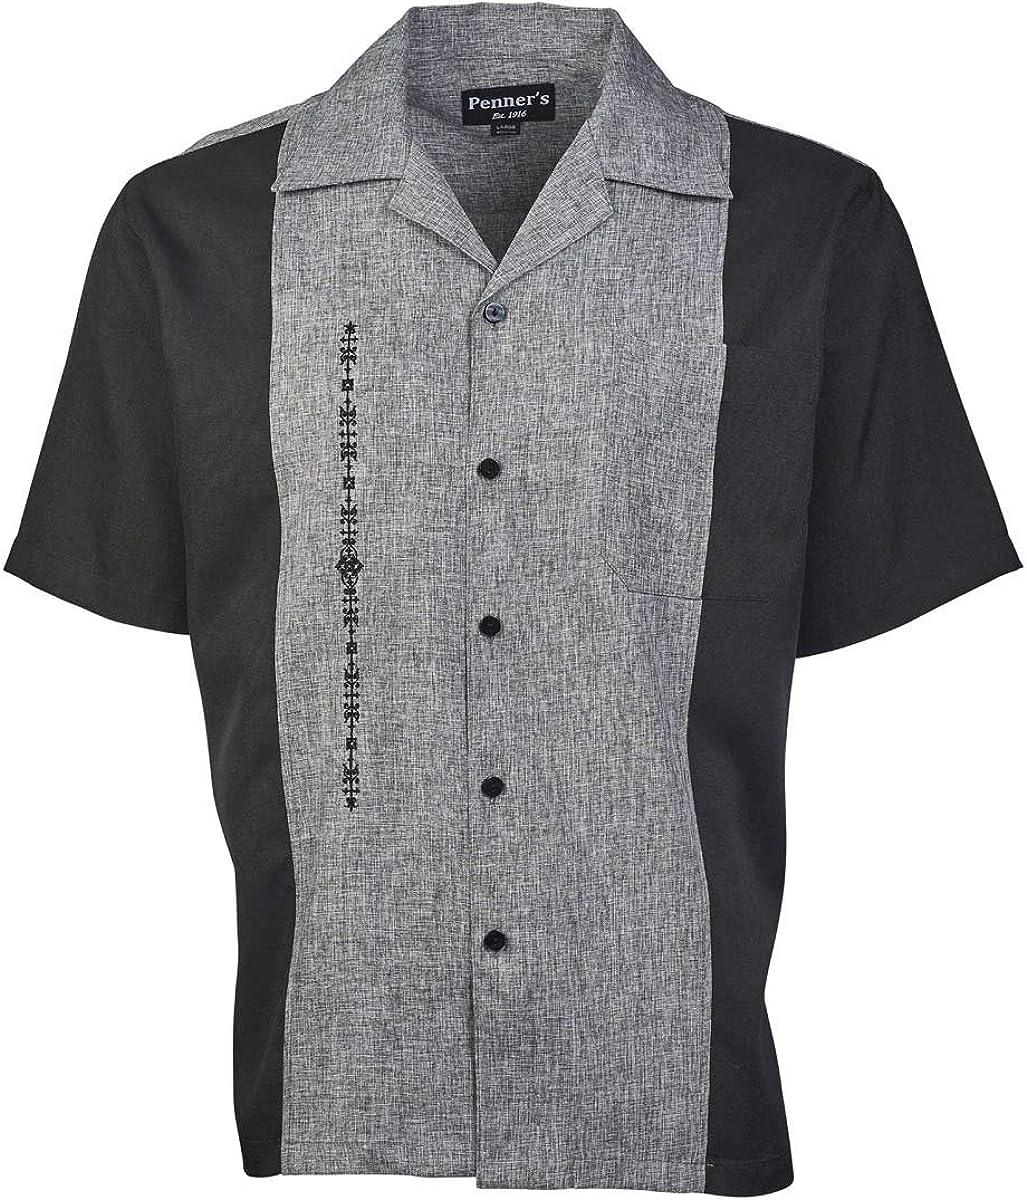 Penner's El Hombre Retro Camp Button Down Short Sleeve Shirt